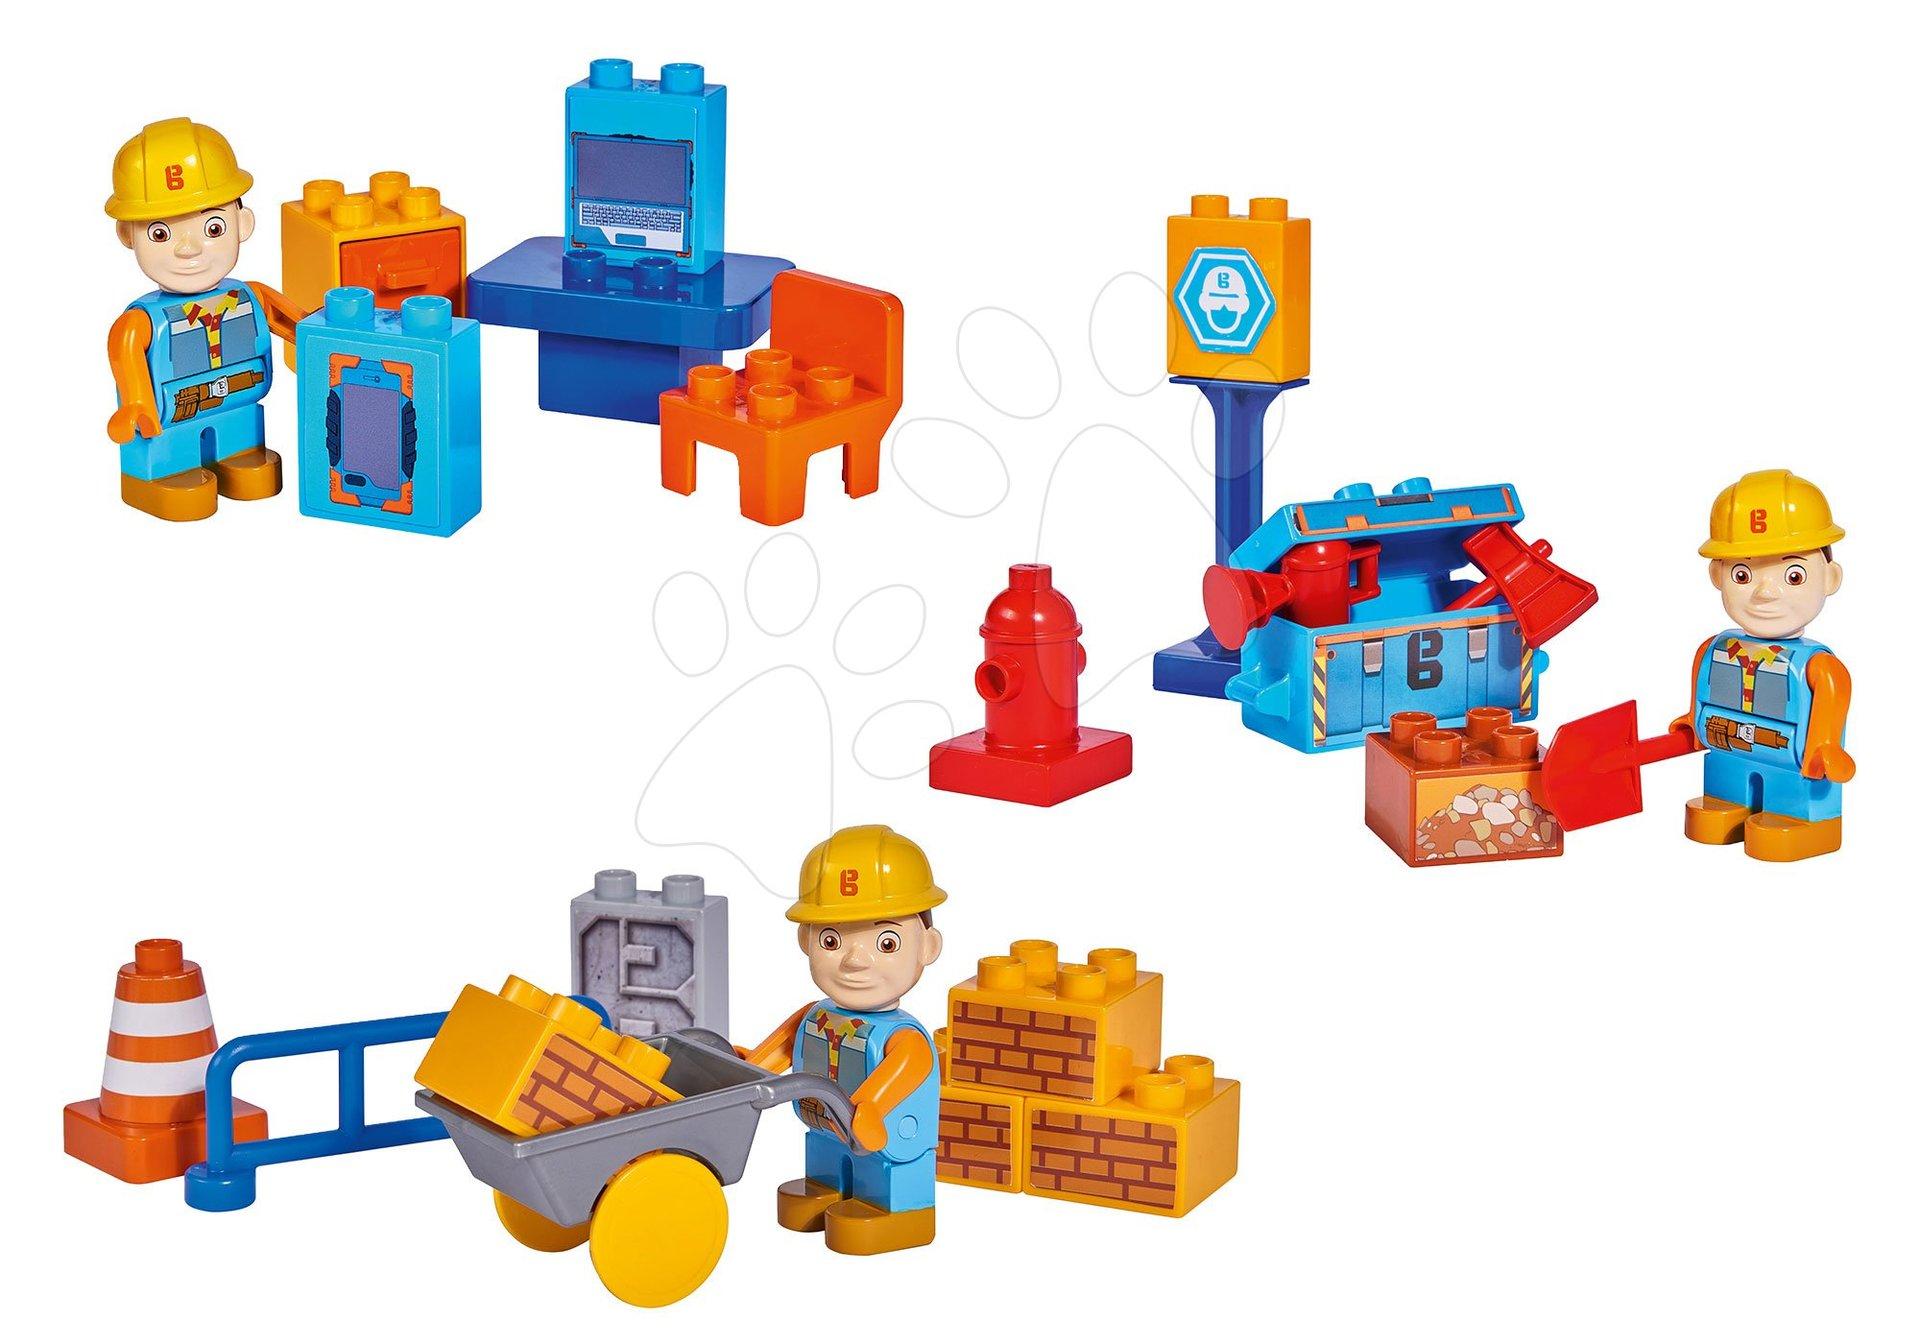 Set 3 stavebníc Staviteľ Bob na stavenisku PlayBIG Bloxx BIG a 3 figúrky od 24 mes